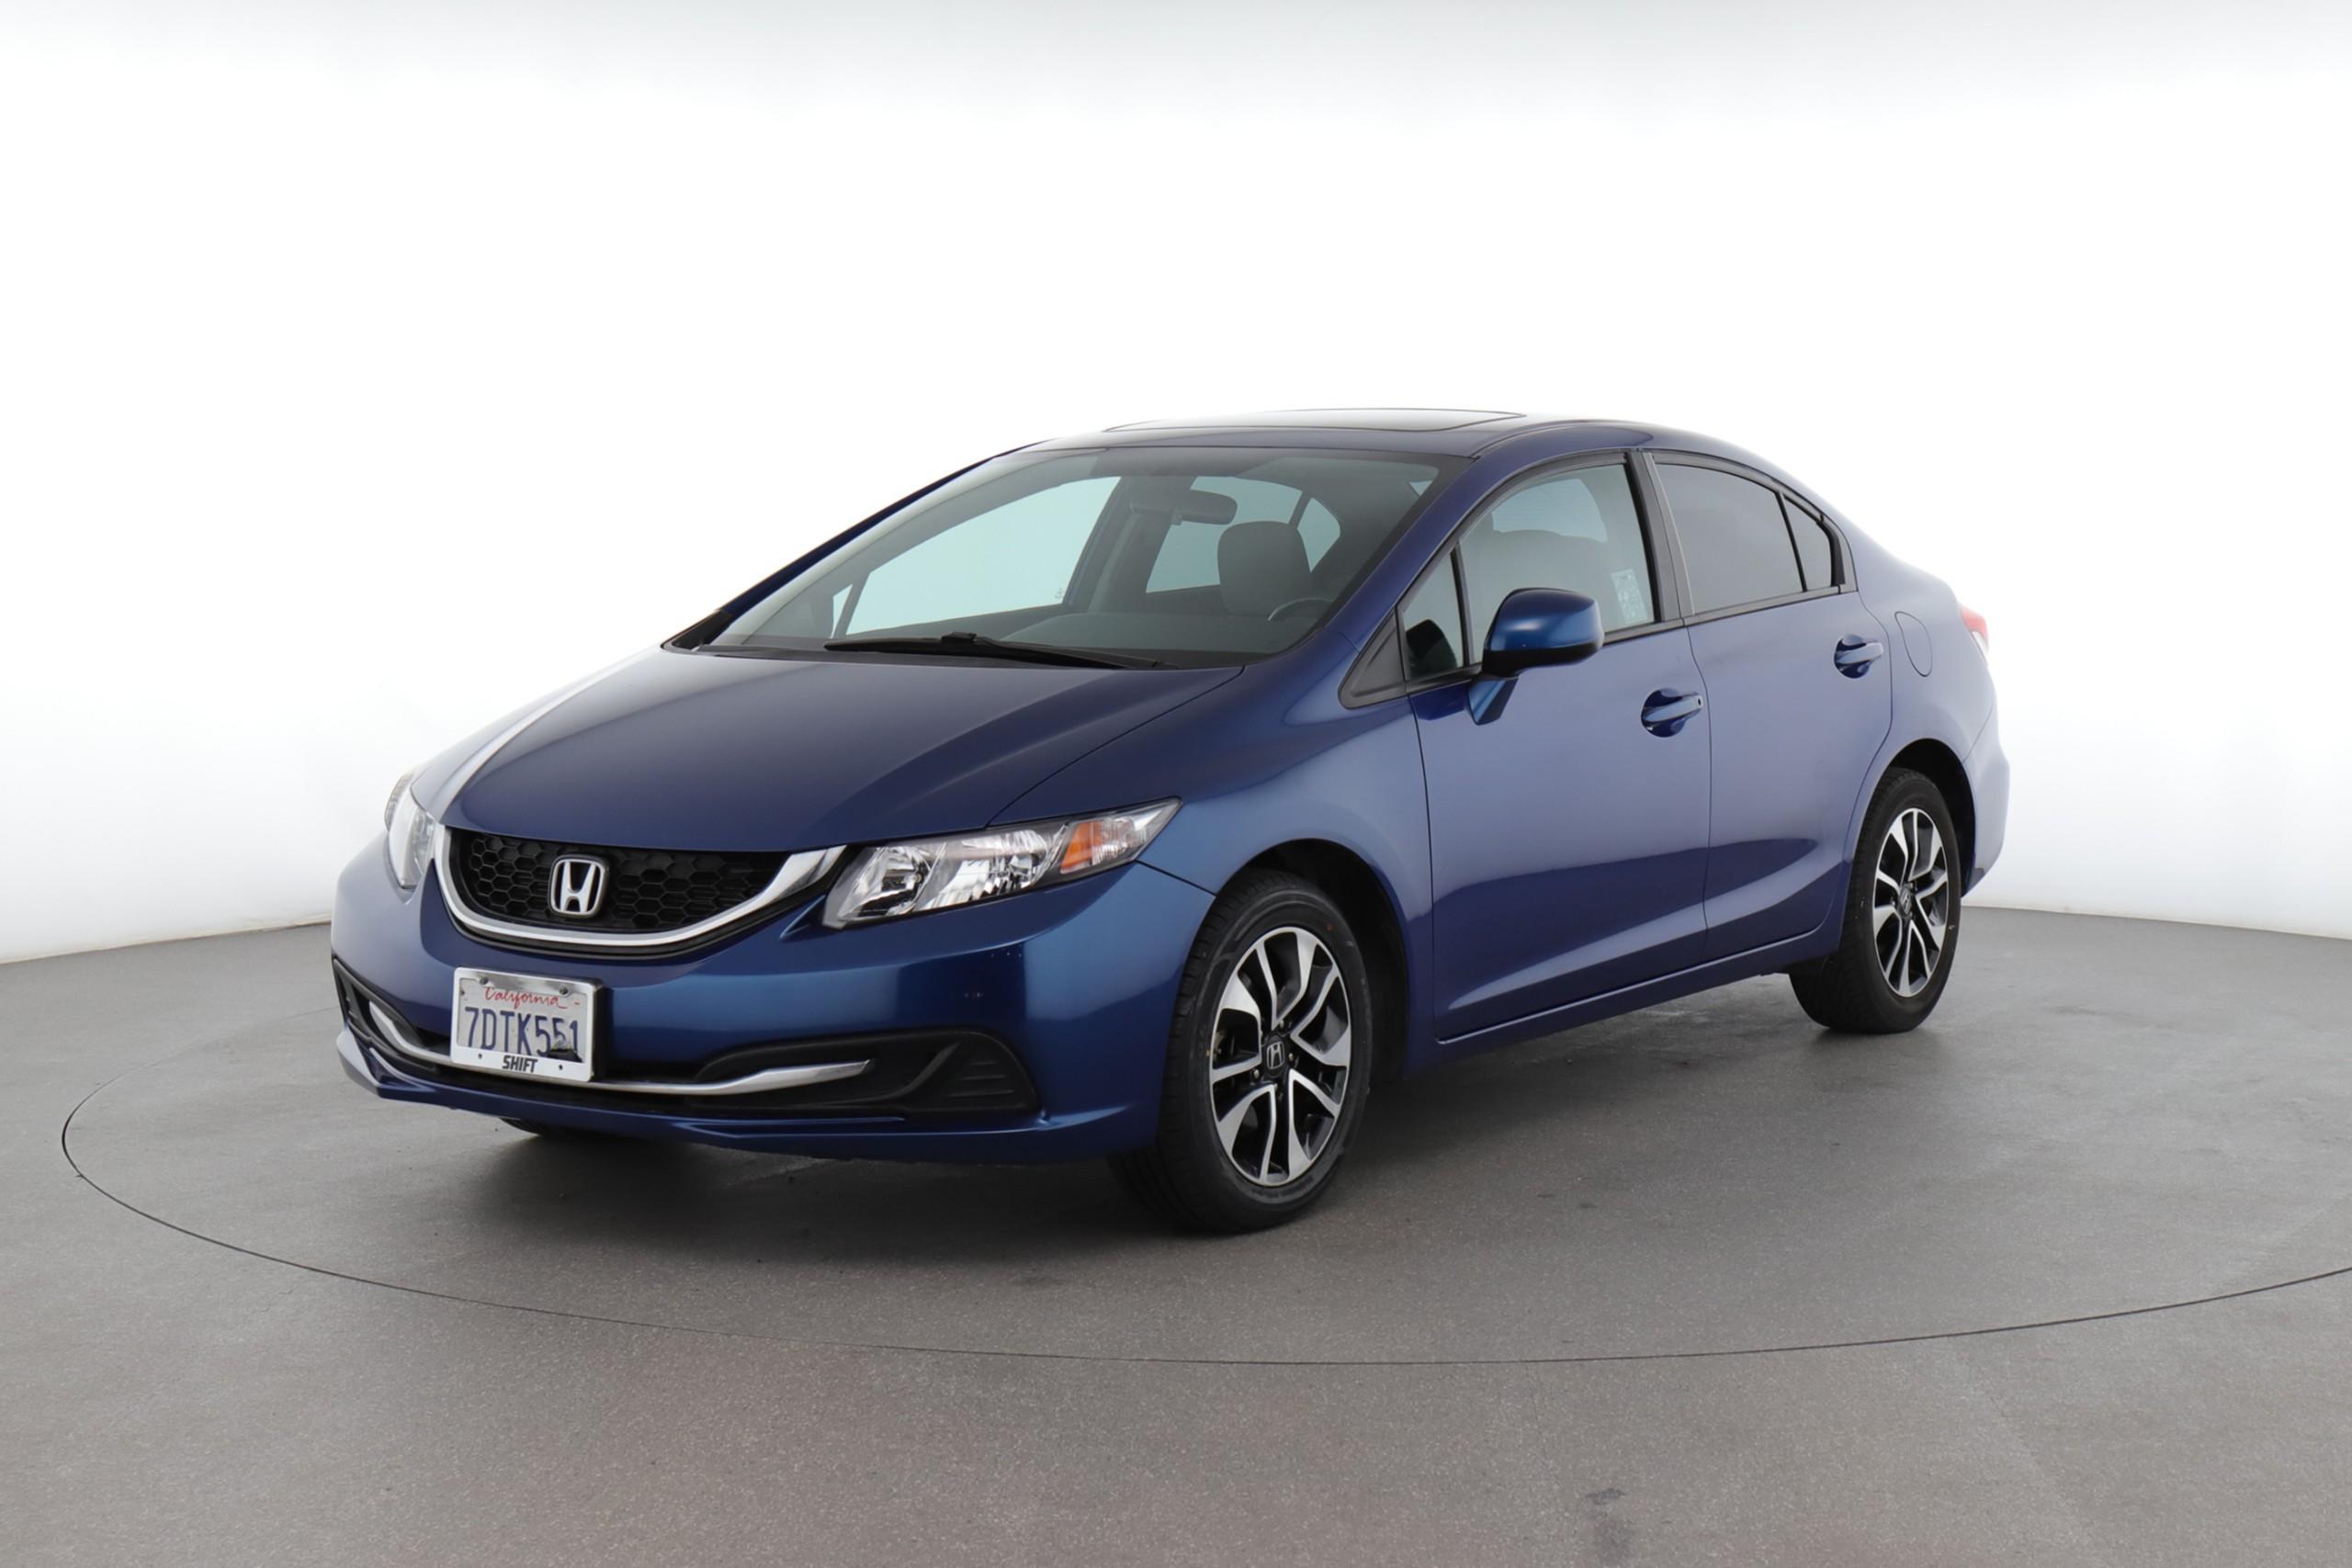 2013 Honda Civic EX (from $13,450)